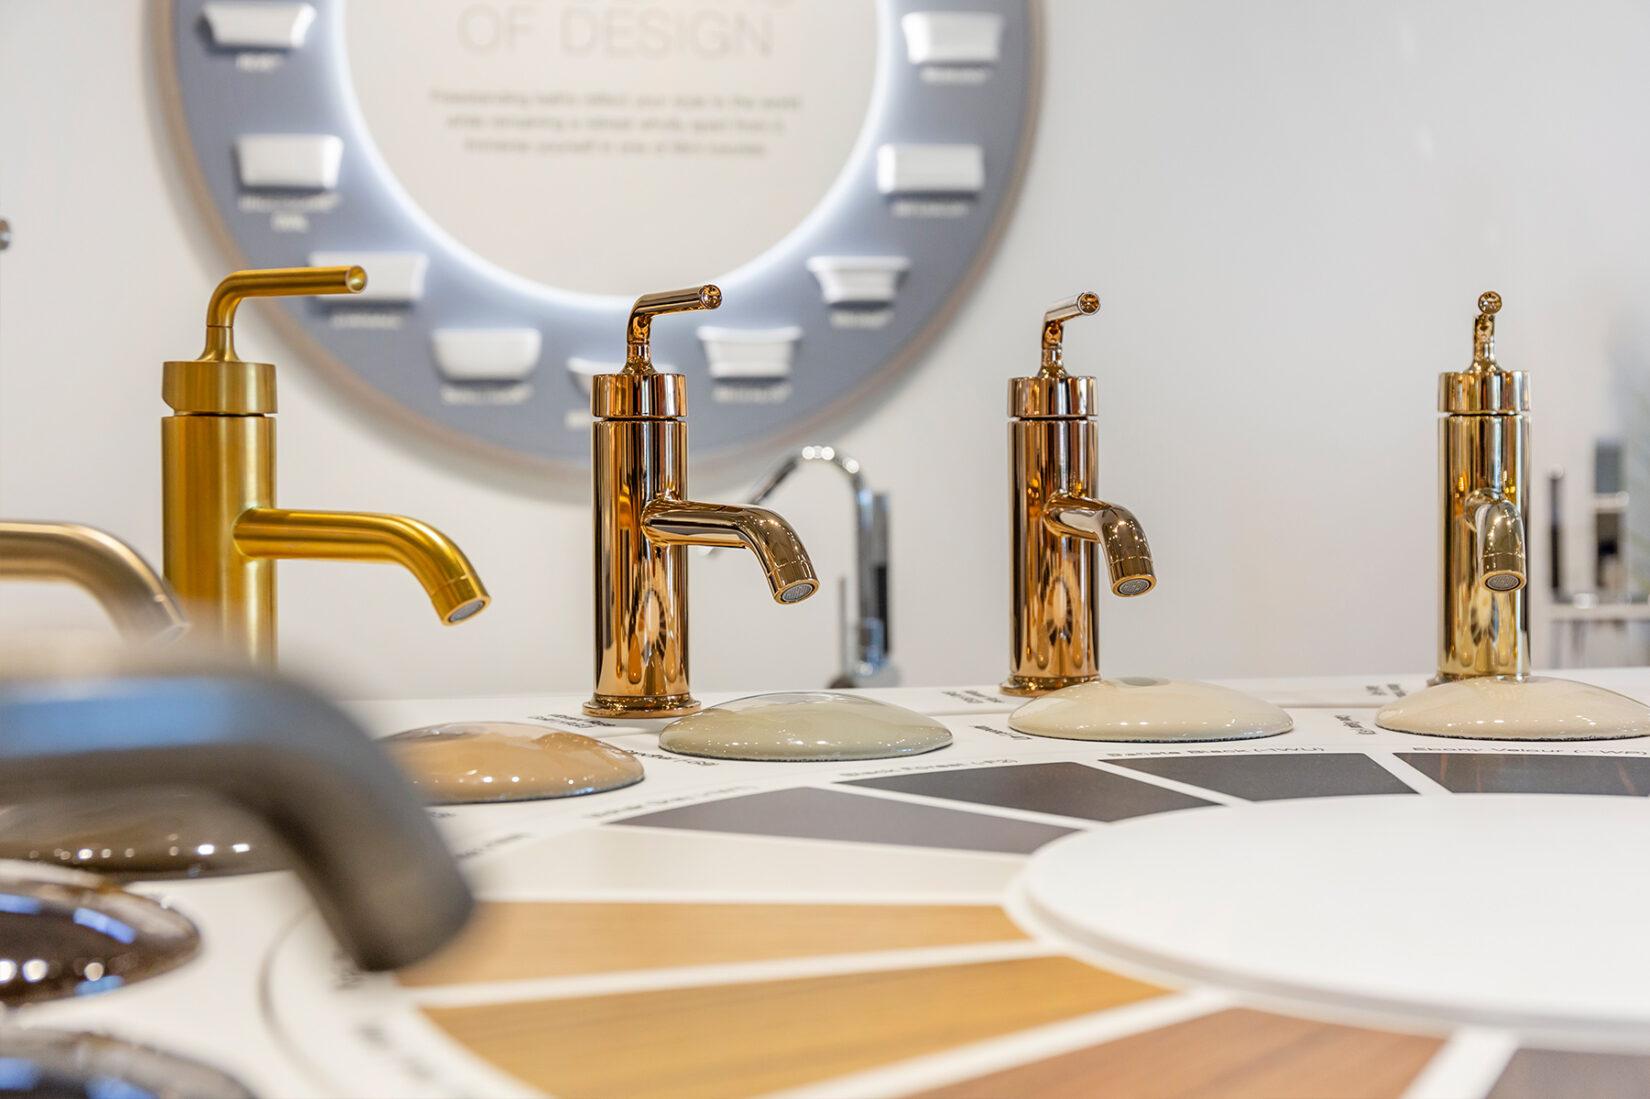 Closeup of Faucets at Kohler Showroom